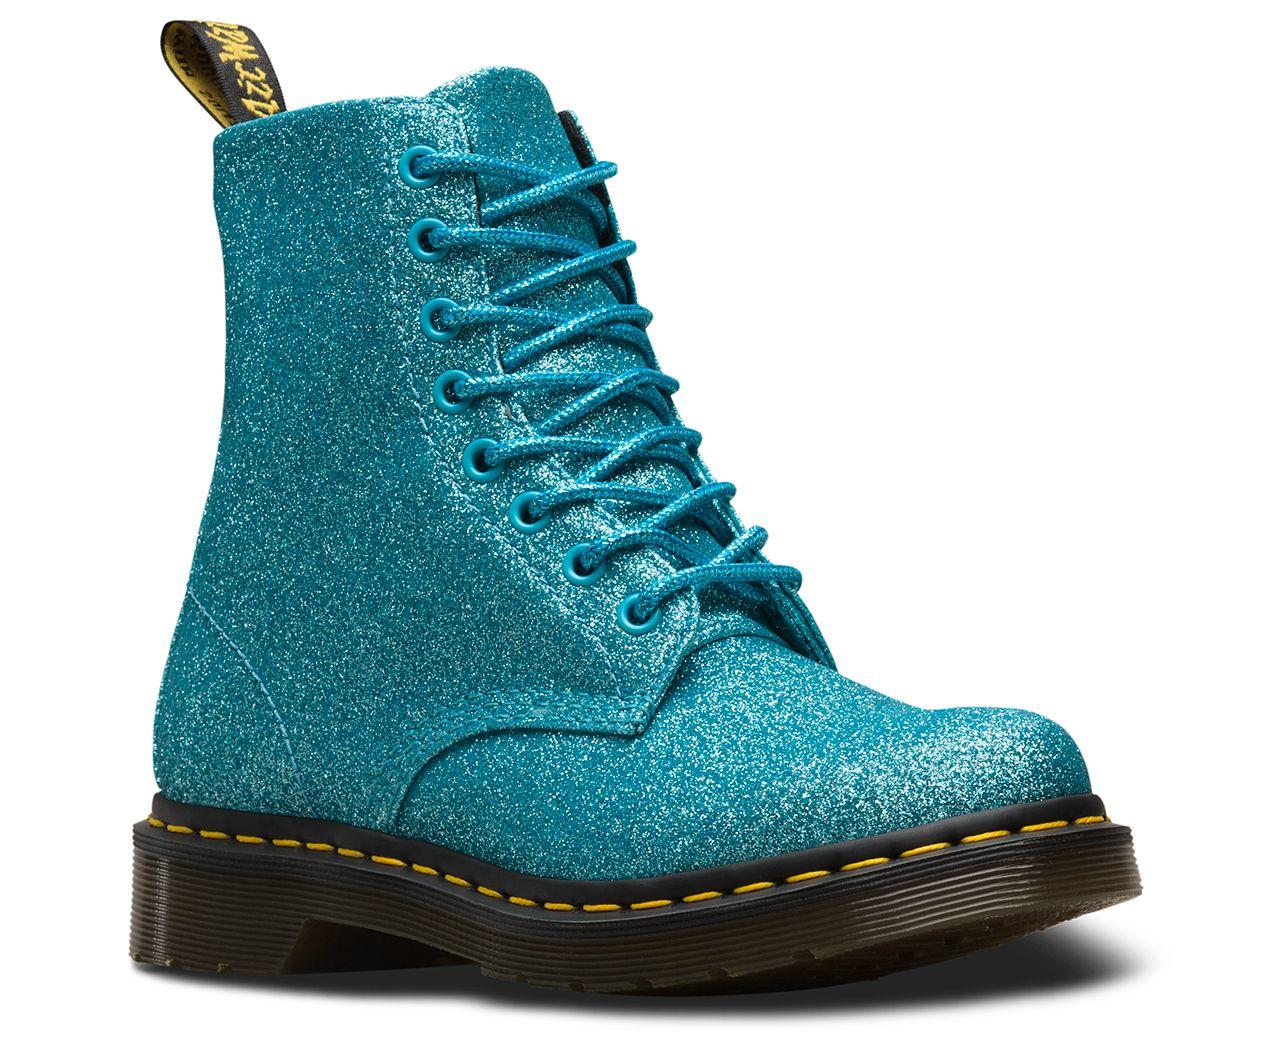 Dr martens 1460 pascal rainbow glitter | Boots, Dr martens